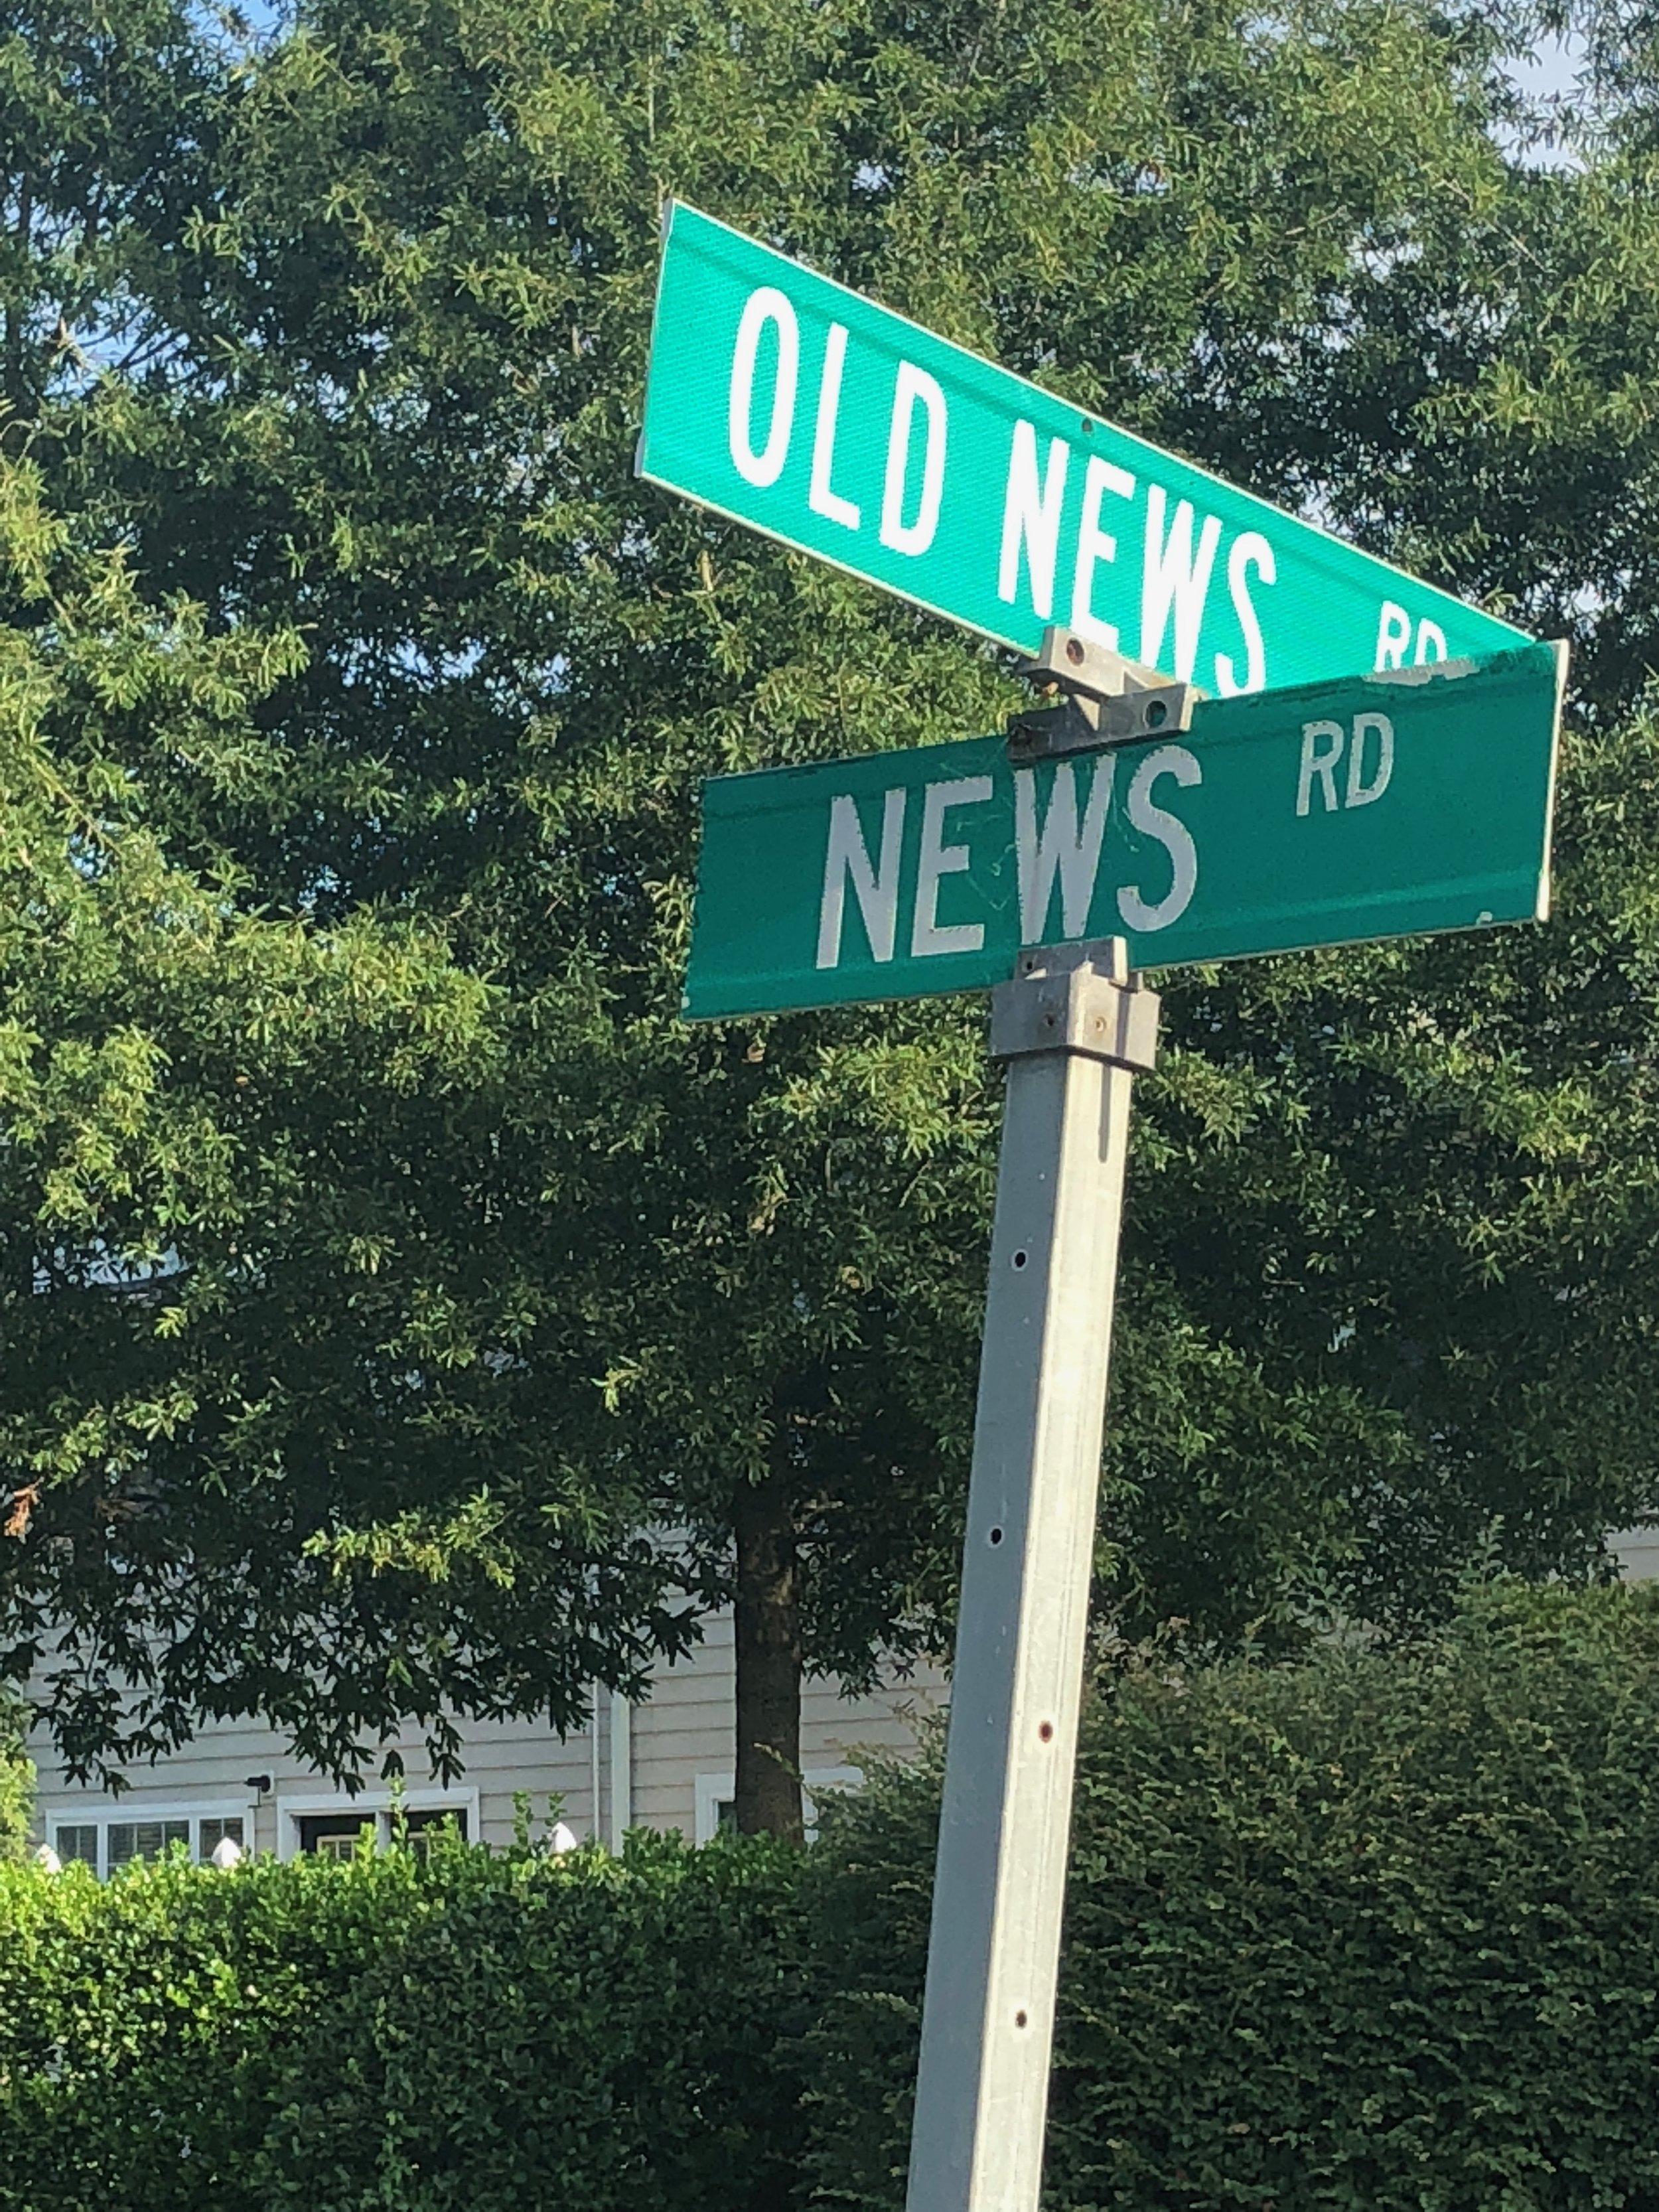 Old News Vs New Rd.jpeg